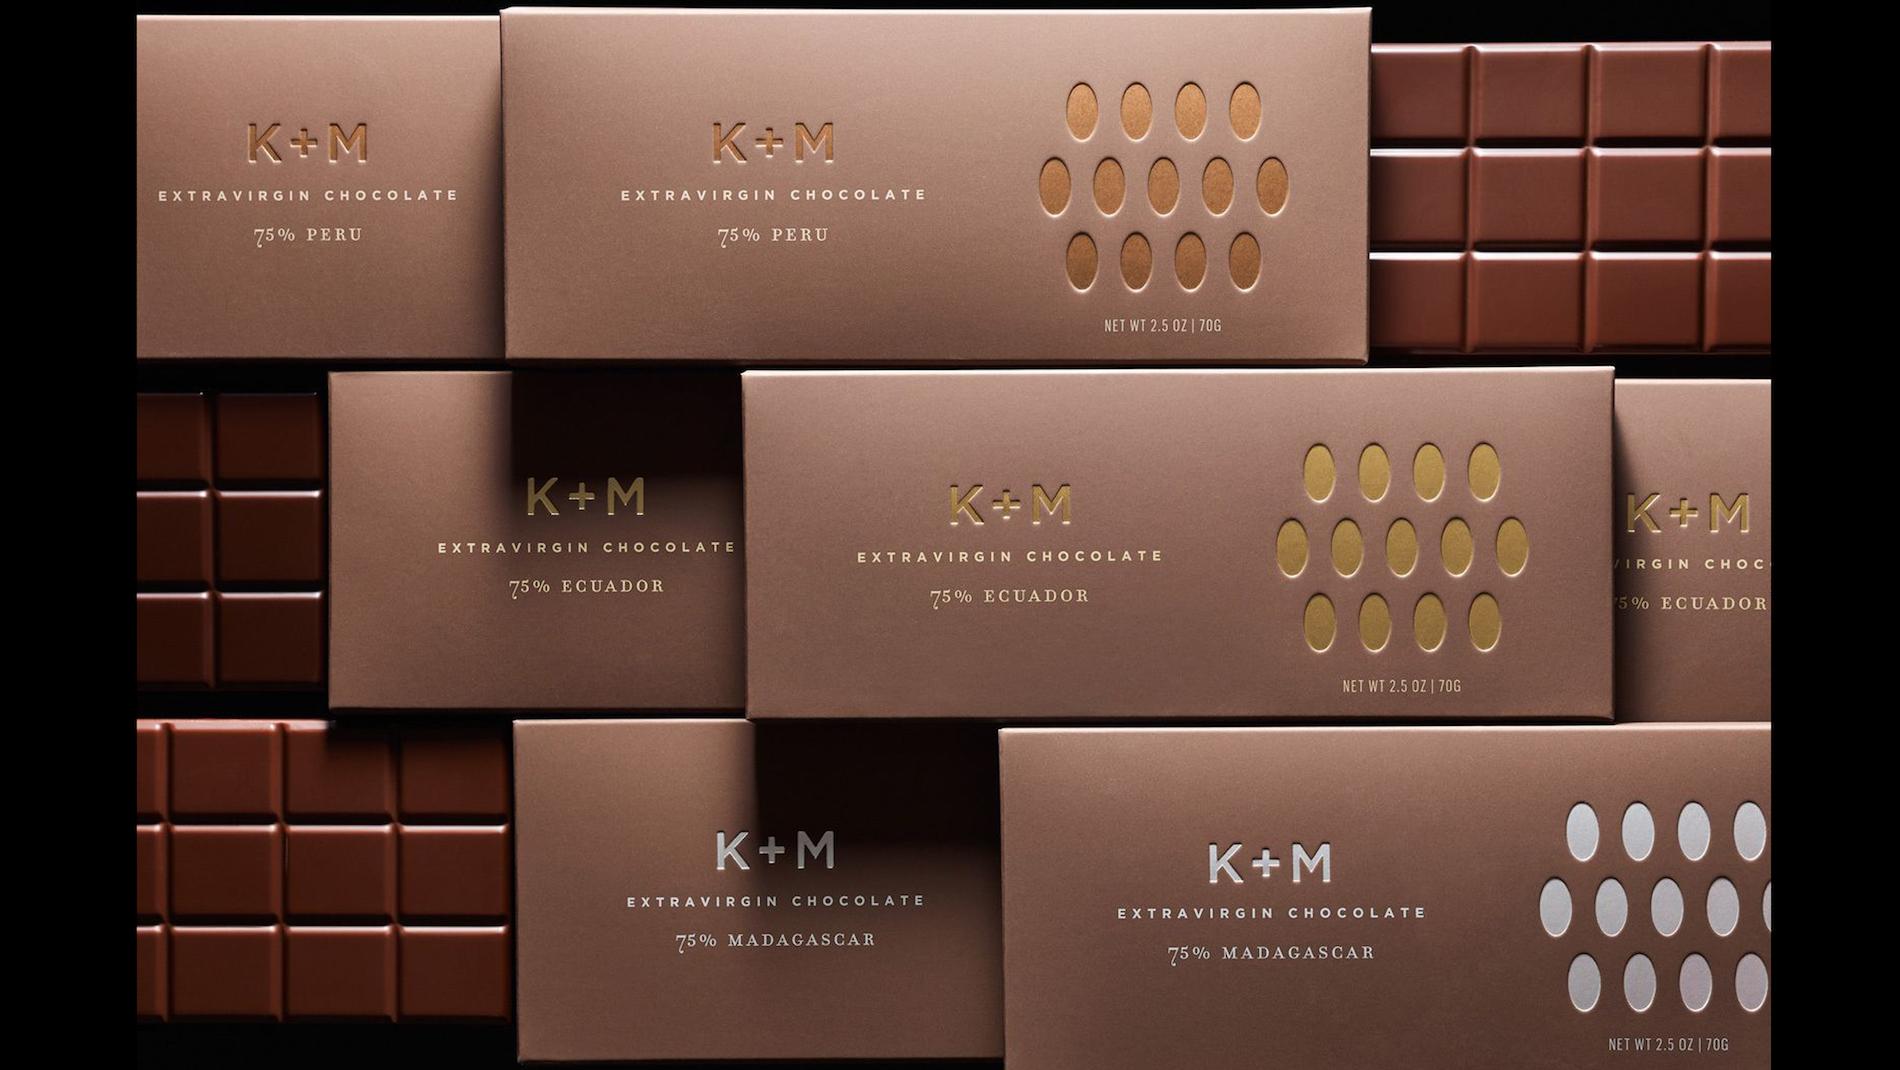 K+M Chocolate Packaging by Morla Design - PaperSpecs